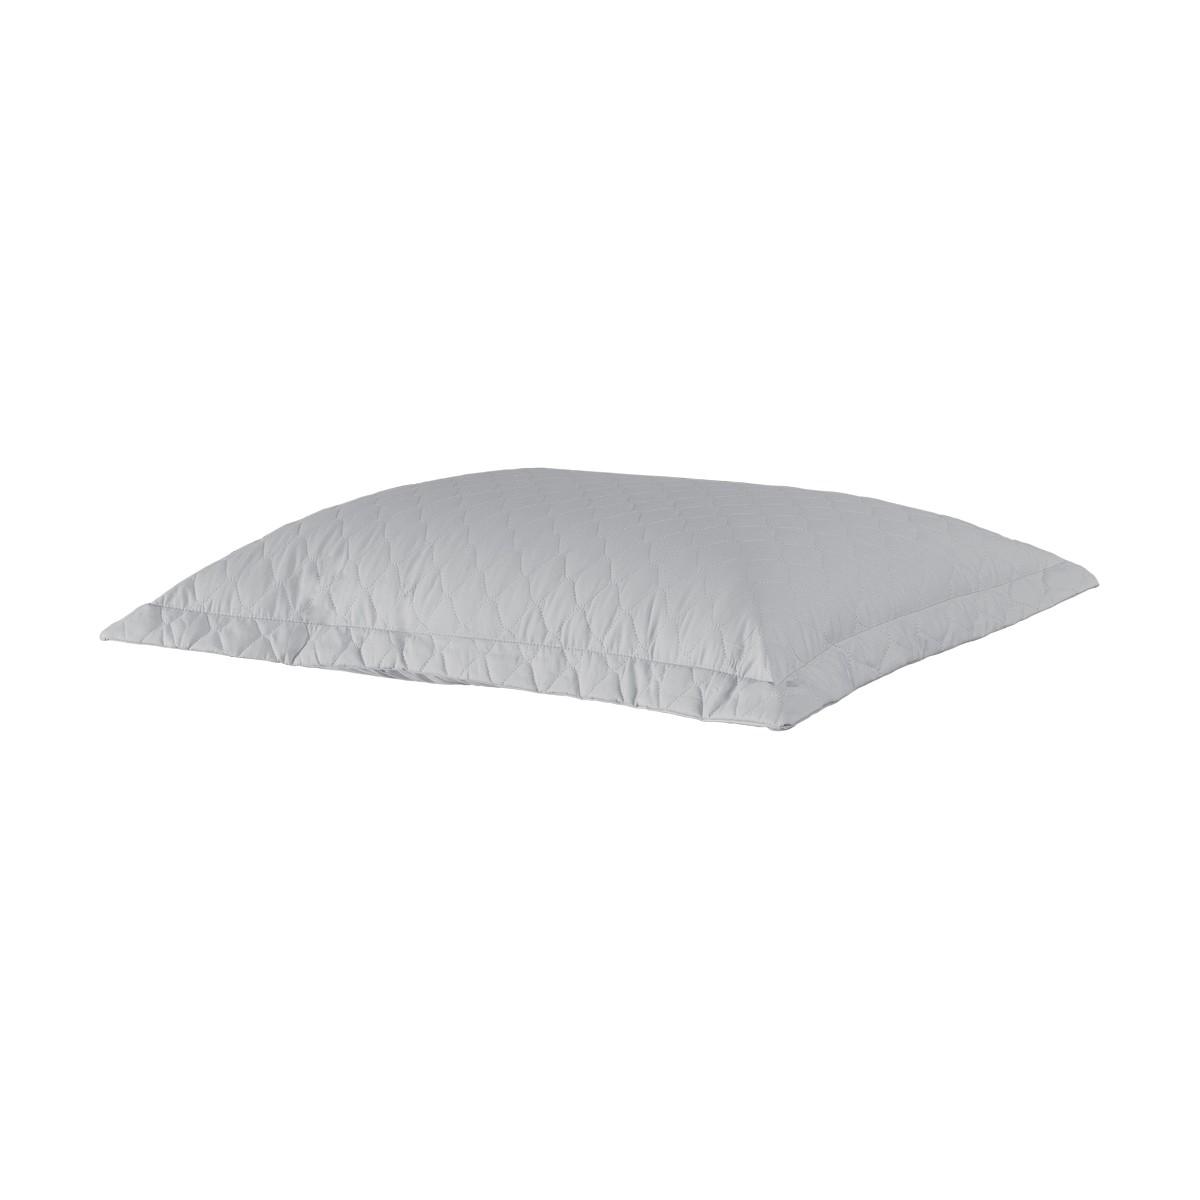 Porta Travesseiro Percal 200 Fios Cinza Claro 50 x 70 cm - Juma